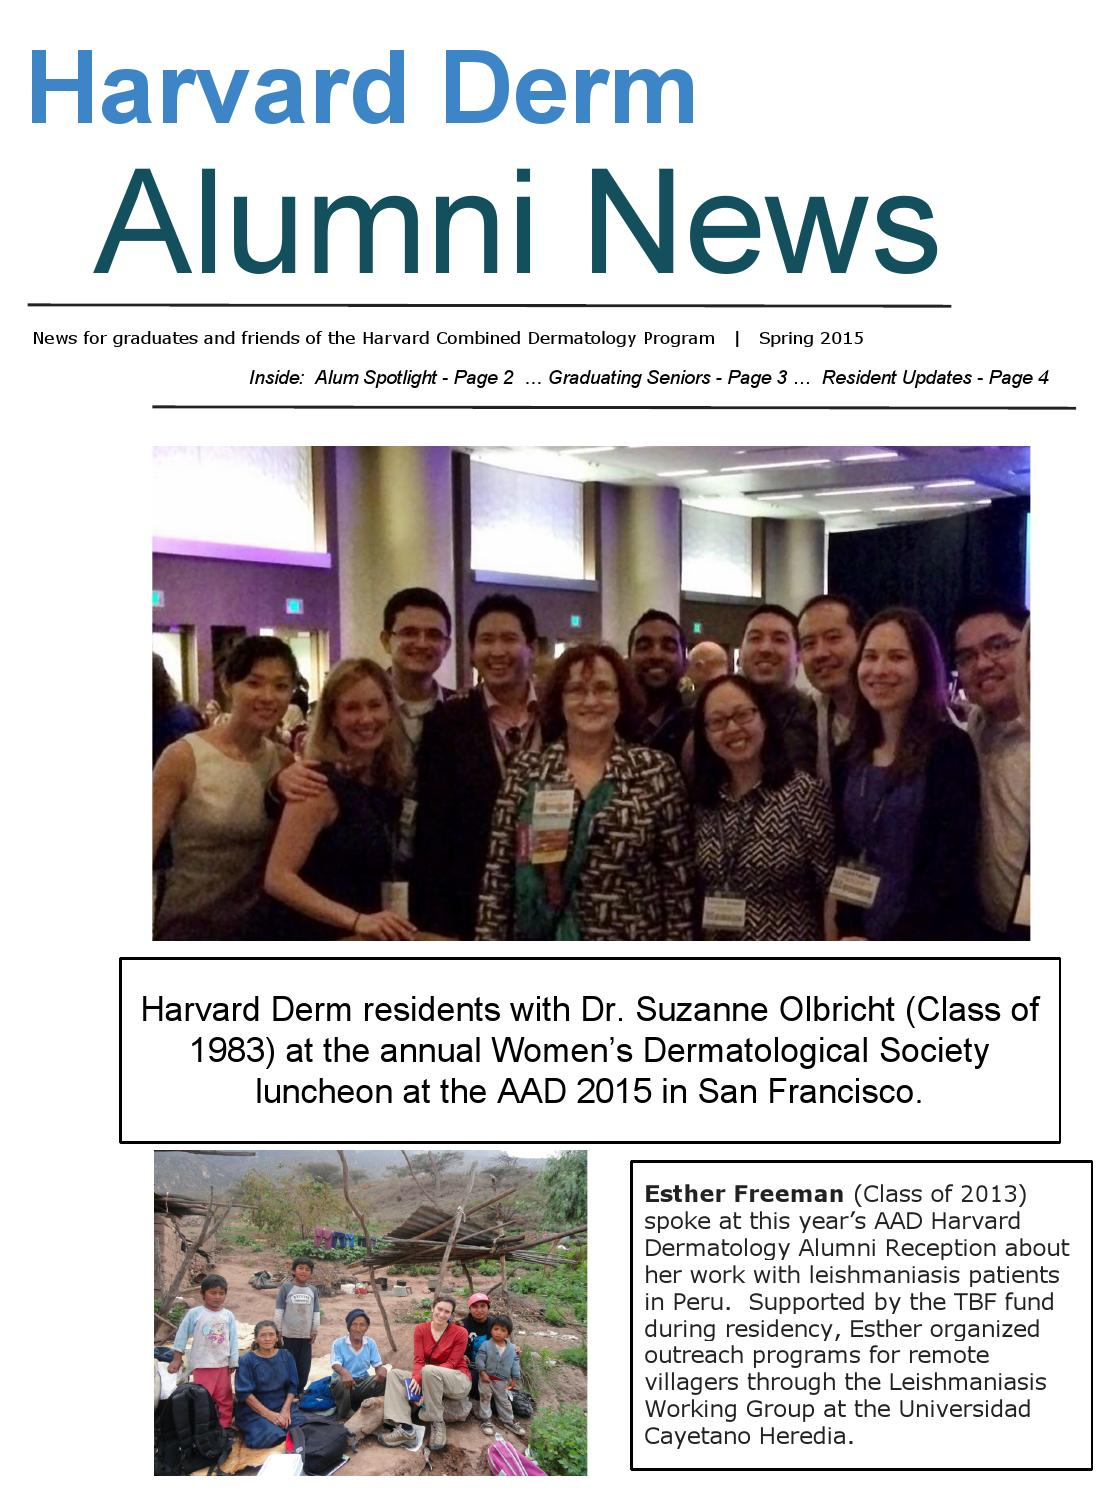 Harvard Derm Spring 2015 Newsletter By Vinod Nambudiri Issuu